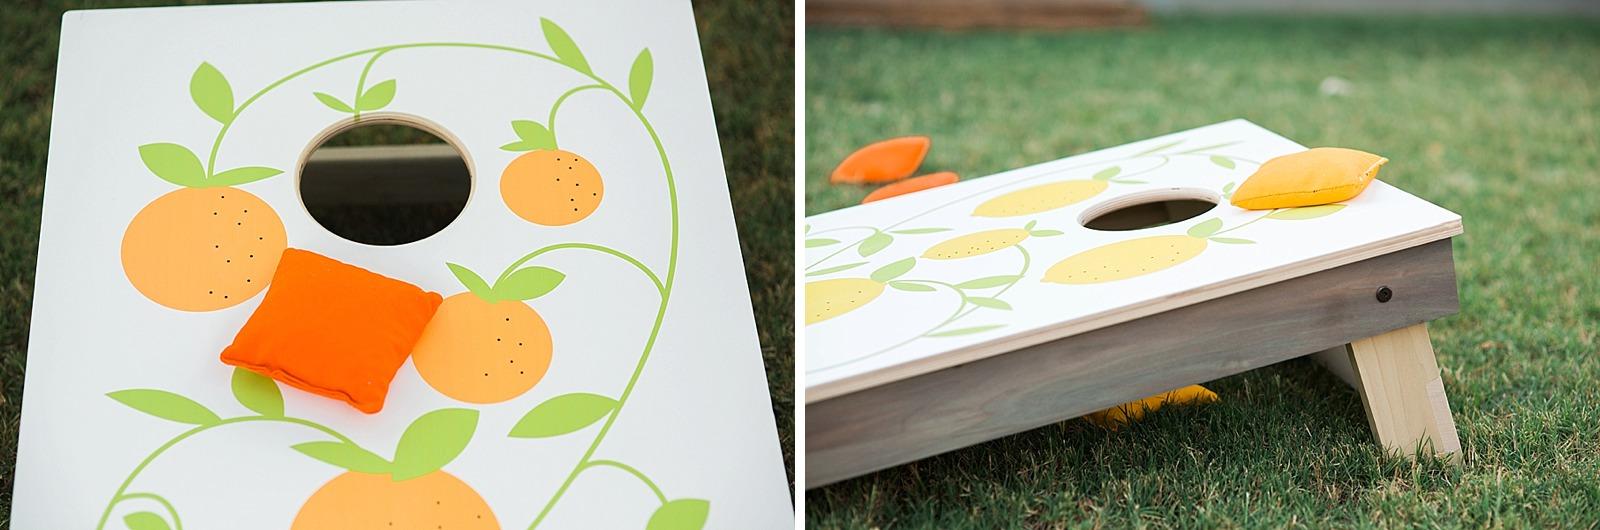 diana-elizabeth-steffen-phoenix-blogger-backyard-games-tosso-com-corn-hole-cornhole-citrus-theme_0092